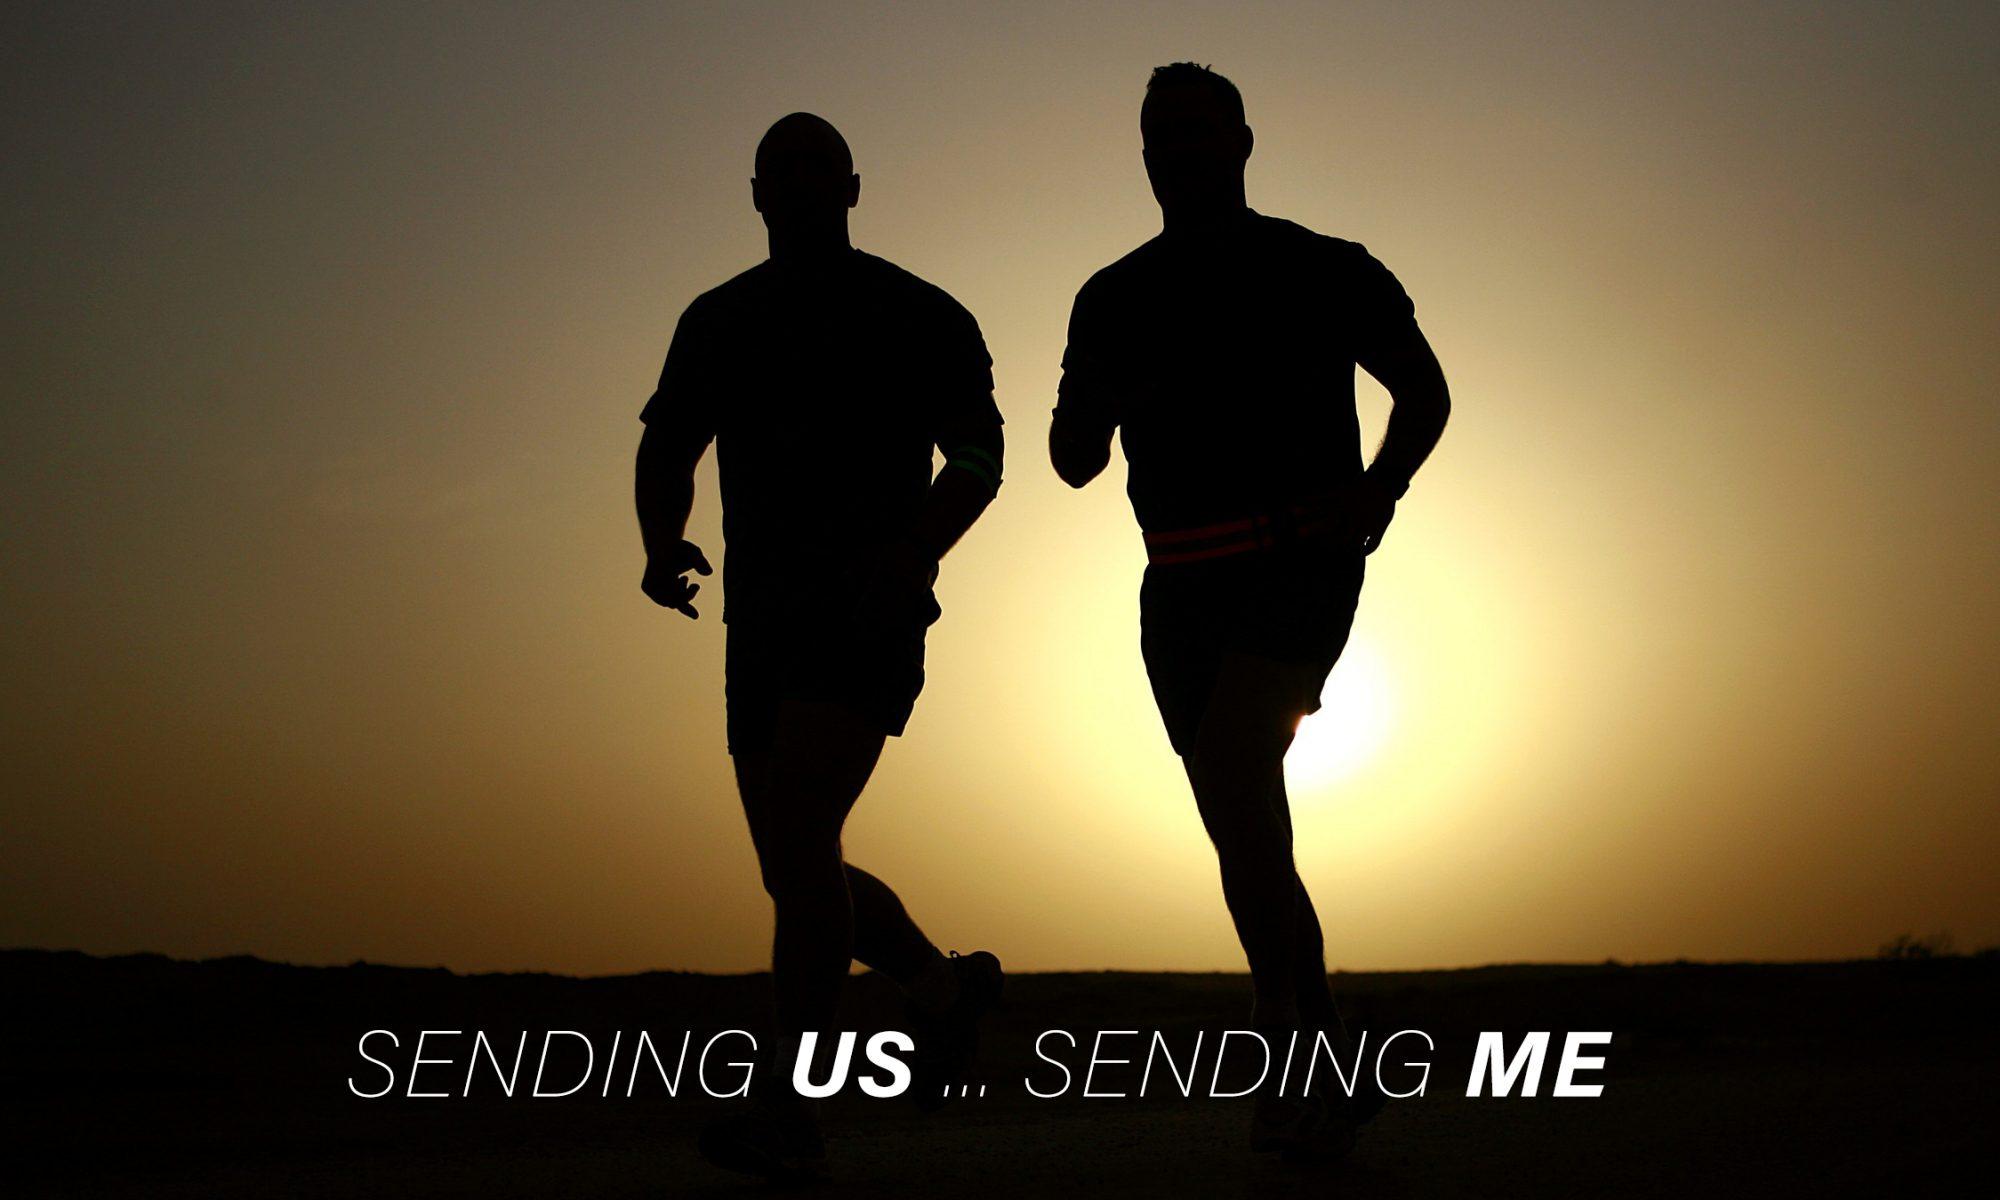 Mission: Sending Us ... Sending Me